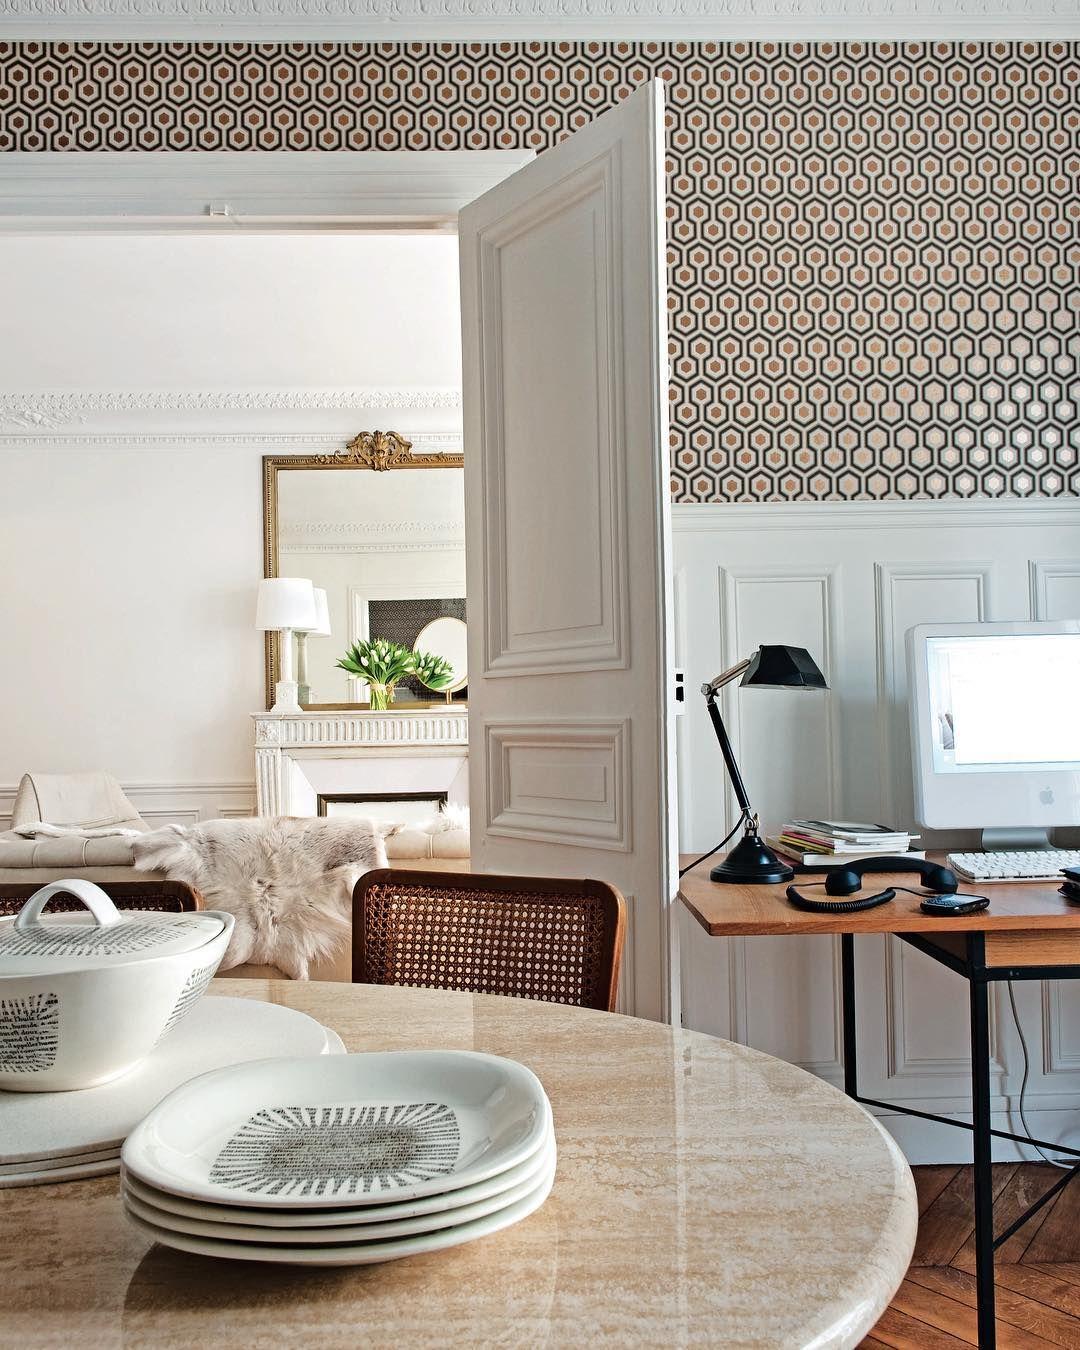 Interiors happy bastilleday tour a french interior designerus